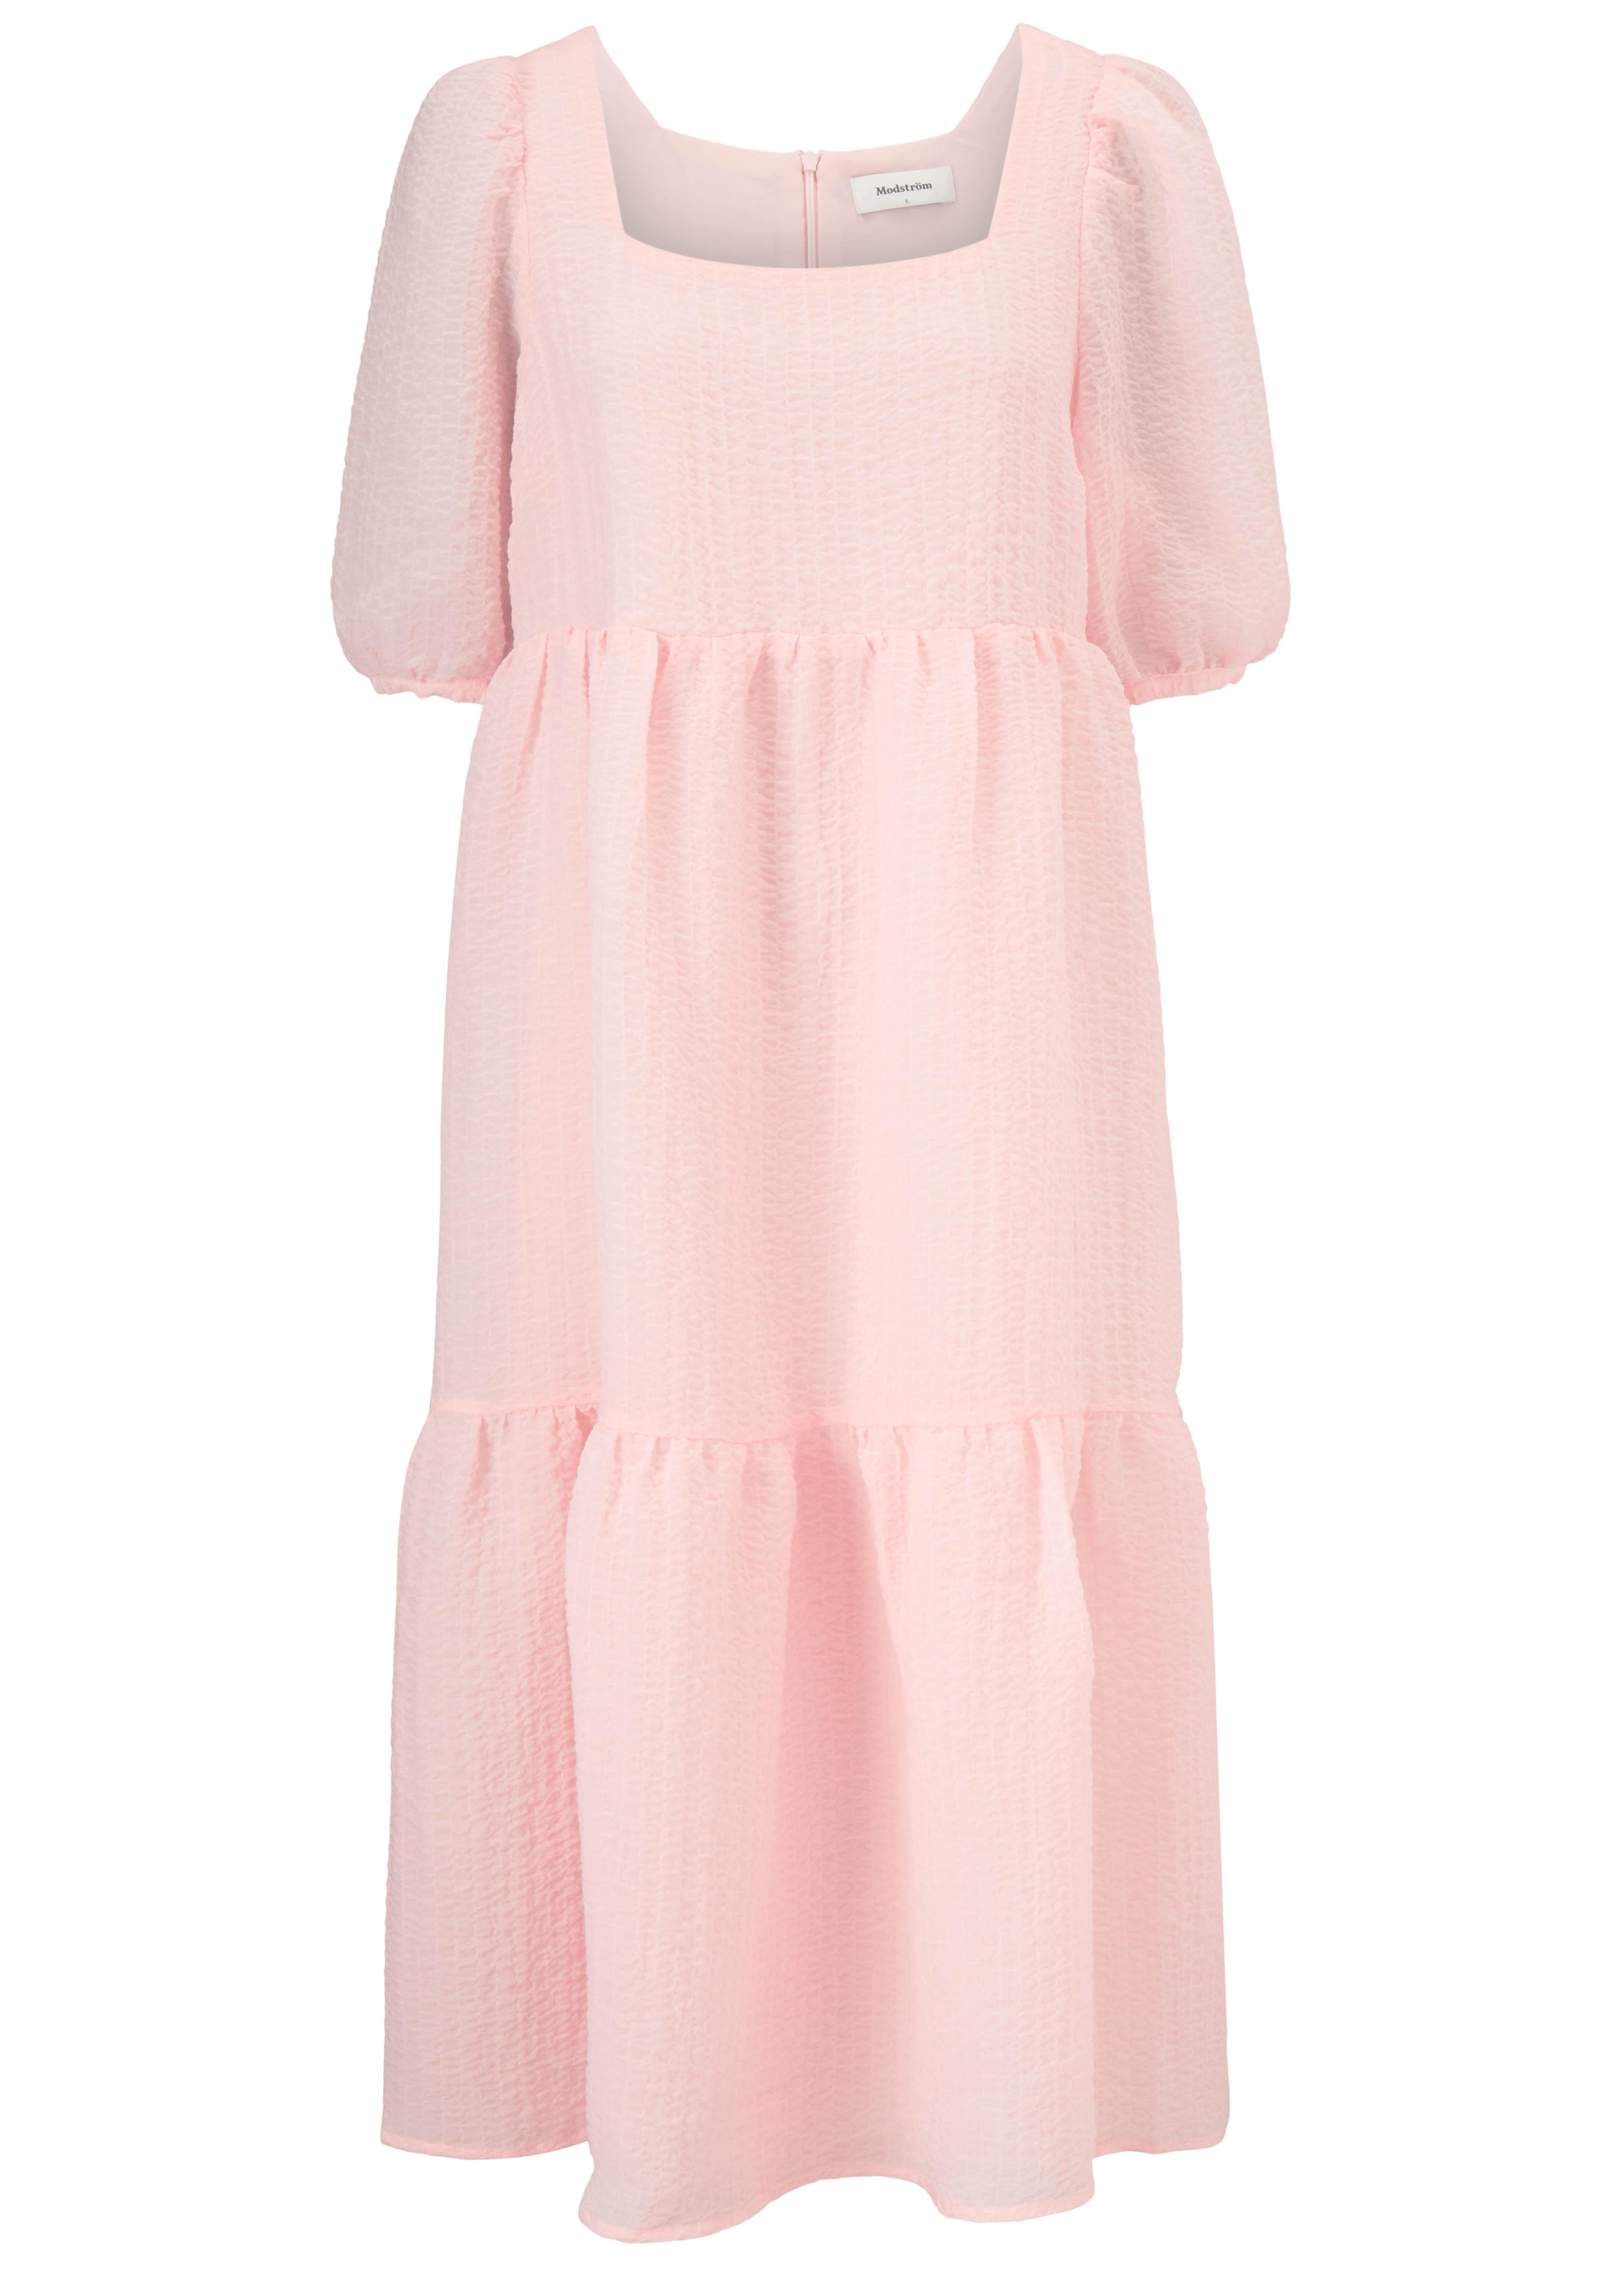 Modström Jackie kjole, peachskin, medium